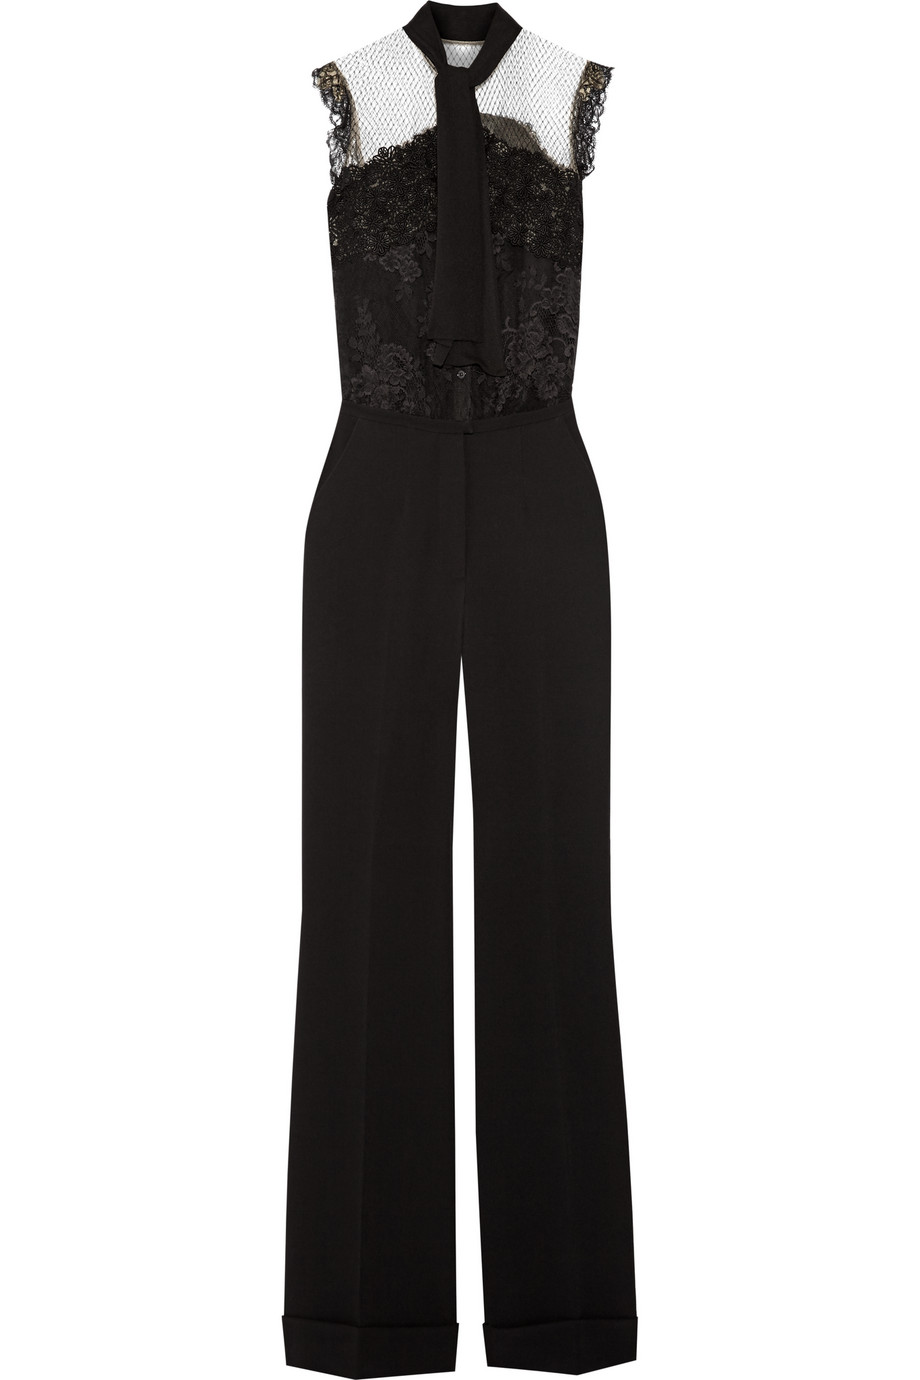 Elie Saab Pussy-Bow Lace-Paneled Crepe Jumpsuit, Size: 34